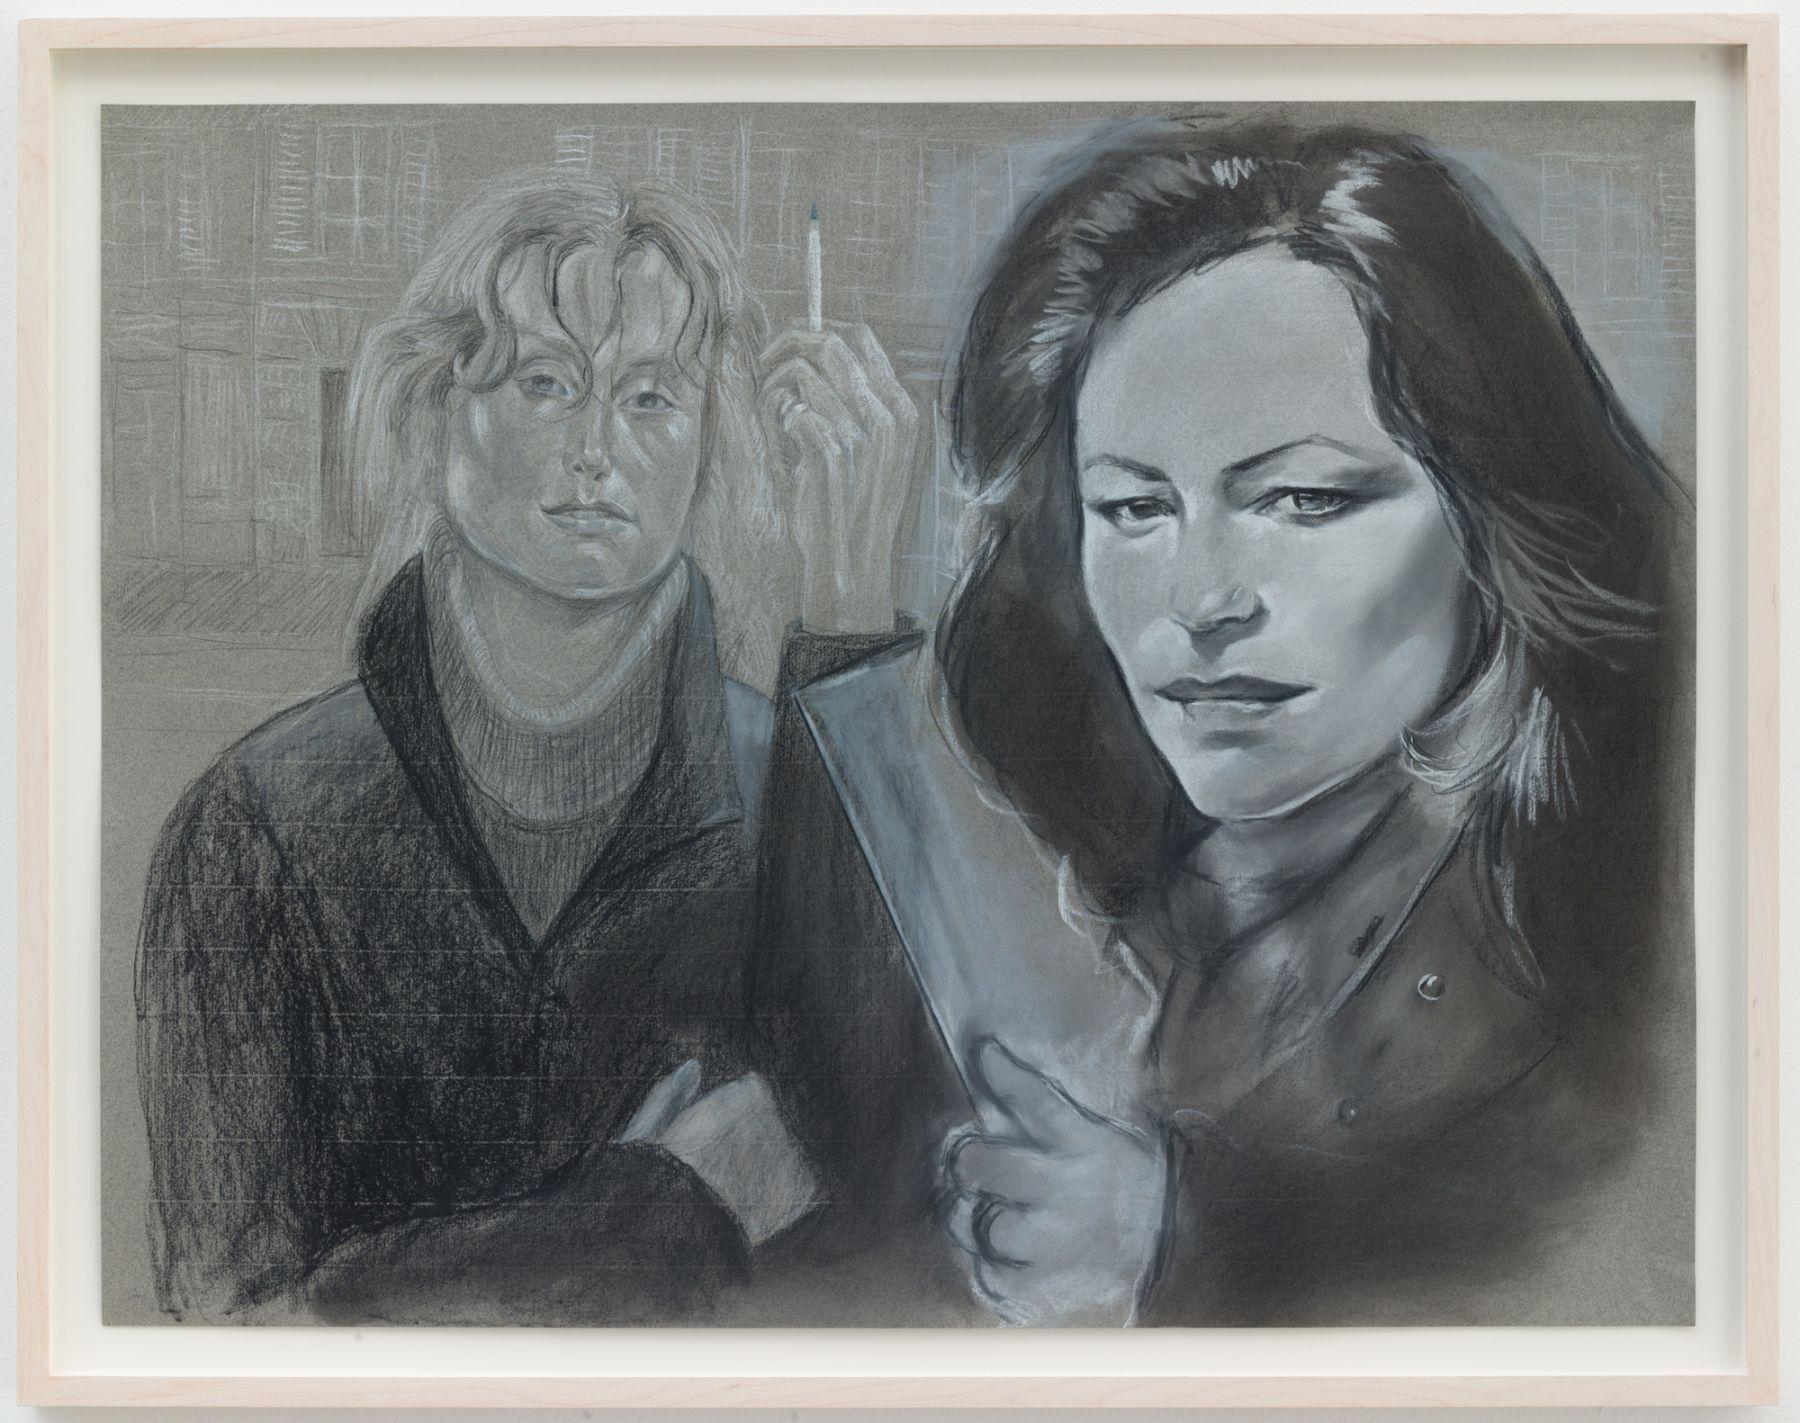 Christian Jankowski, Isabelle Huppert - Tessa Charlotte Rampling